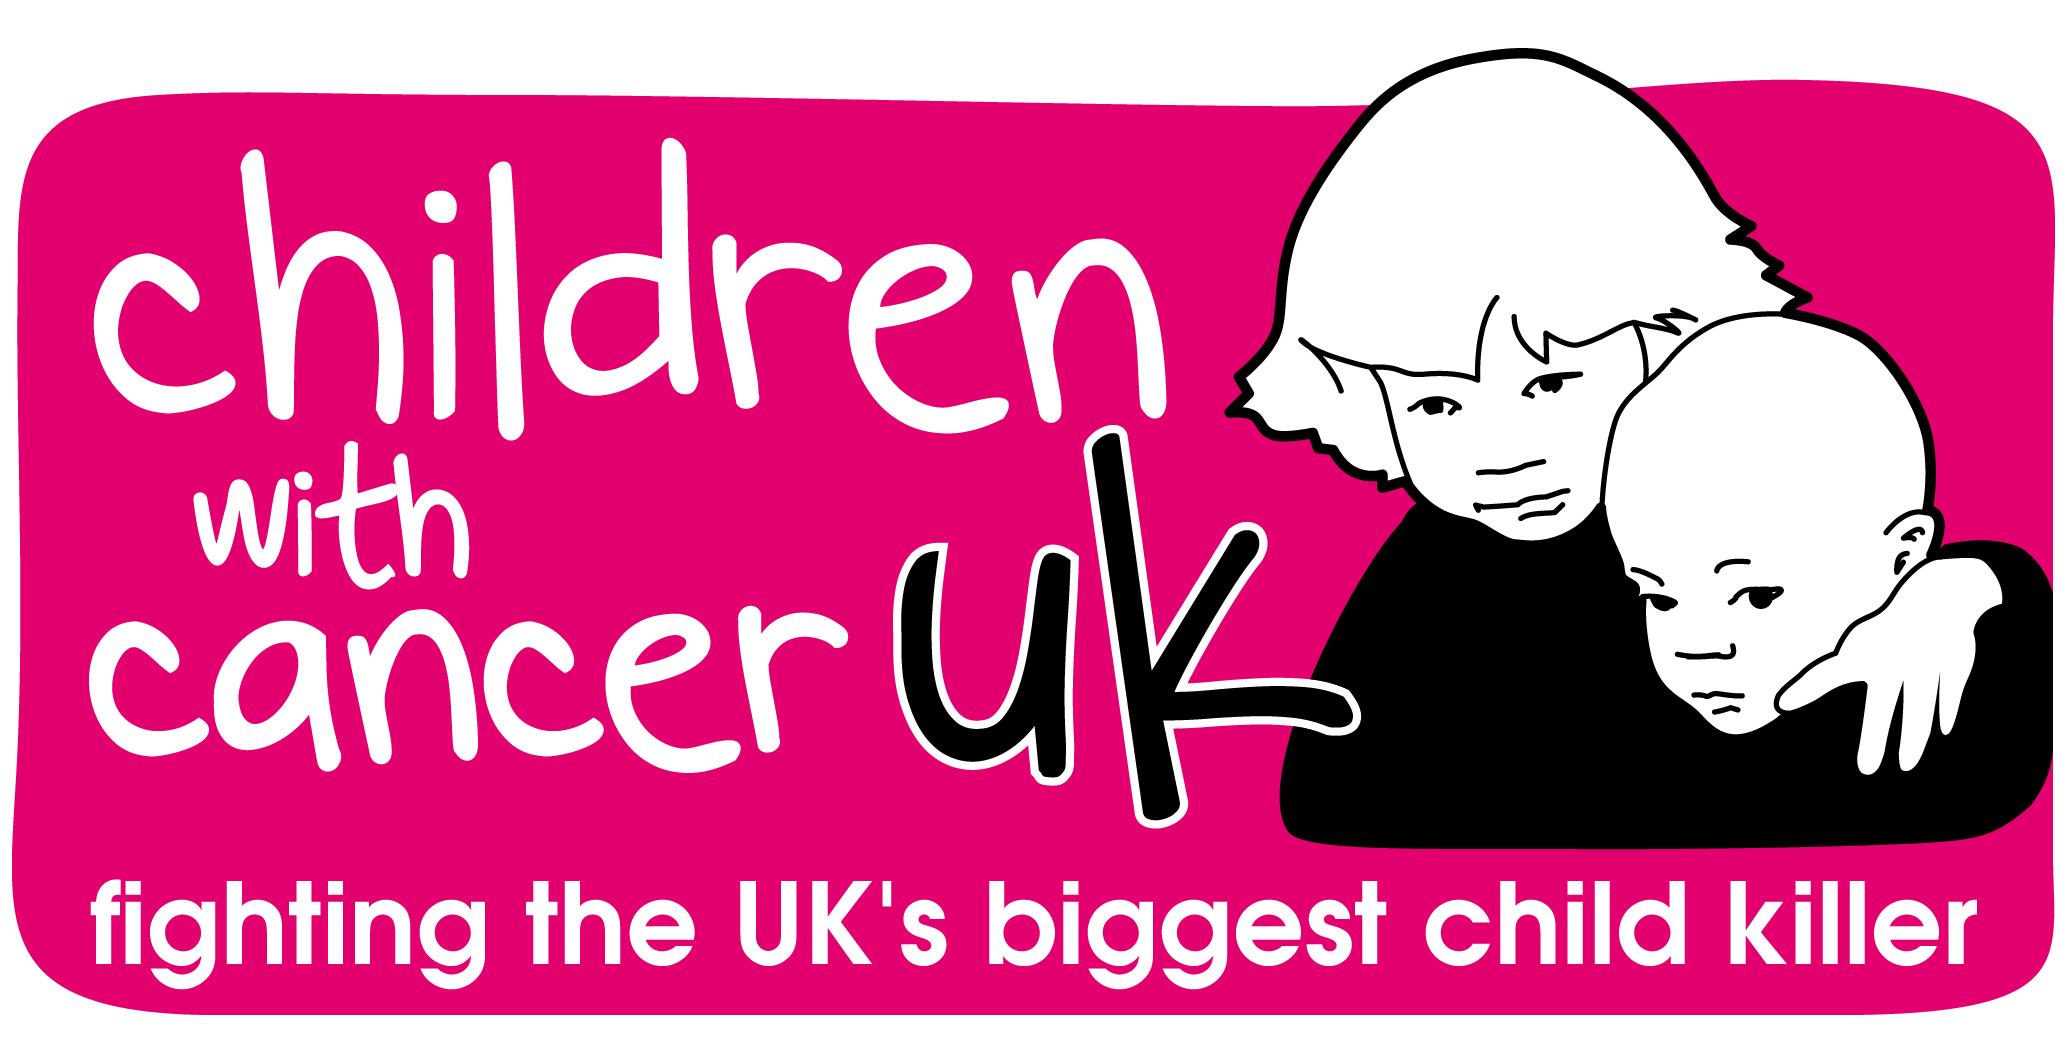 TTG Top 50 chosen charity - Children with Cancer UK